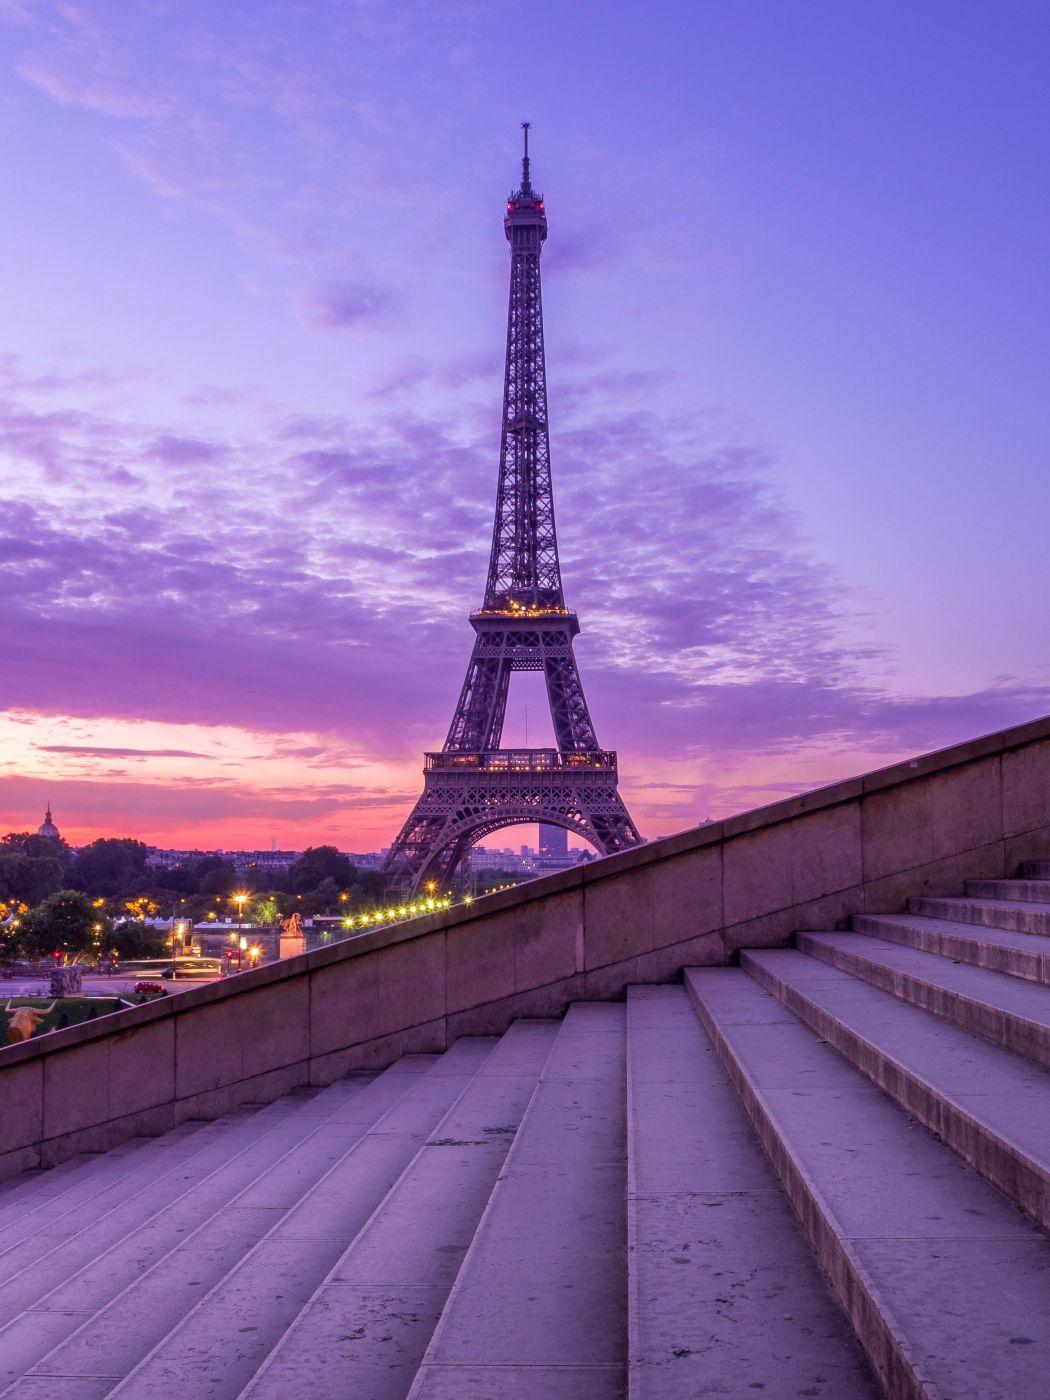 Trocadero - Steps, France